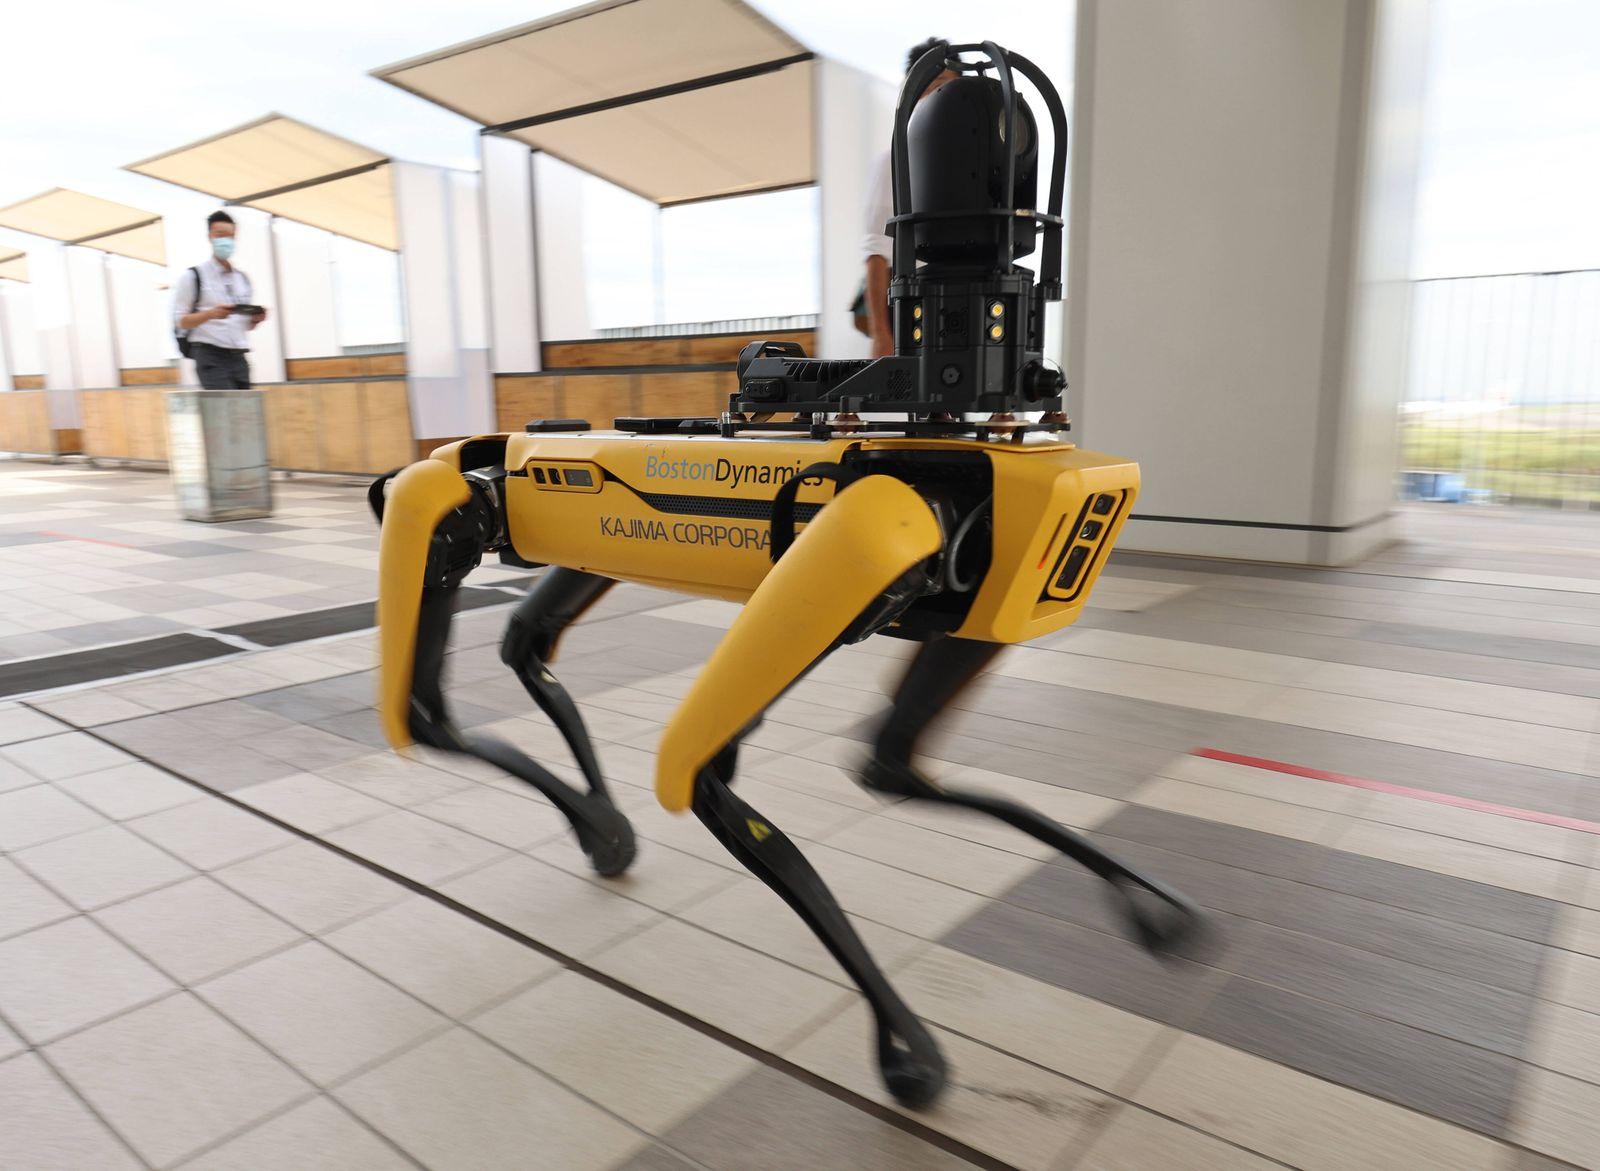 News Bilder des Tages September 18, 2020, Tokyo, Japan - Softbank s subsidiary Boston Dynamics quadruped robot Spot demo